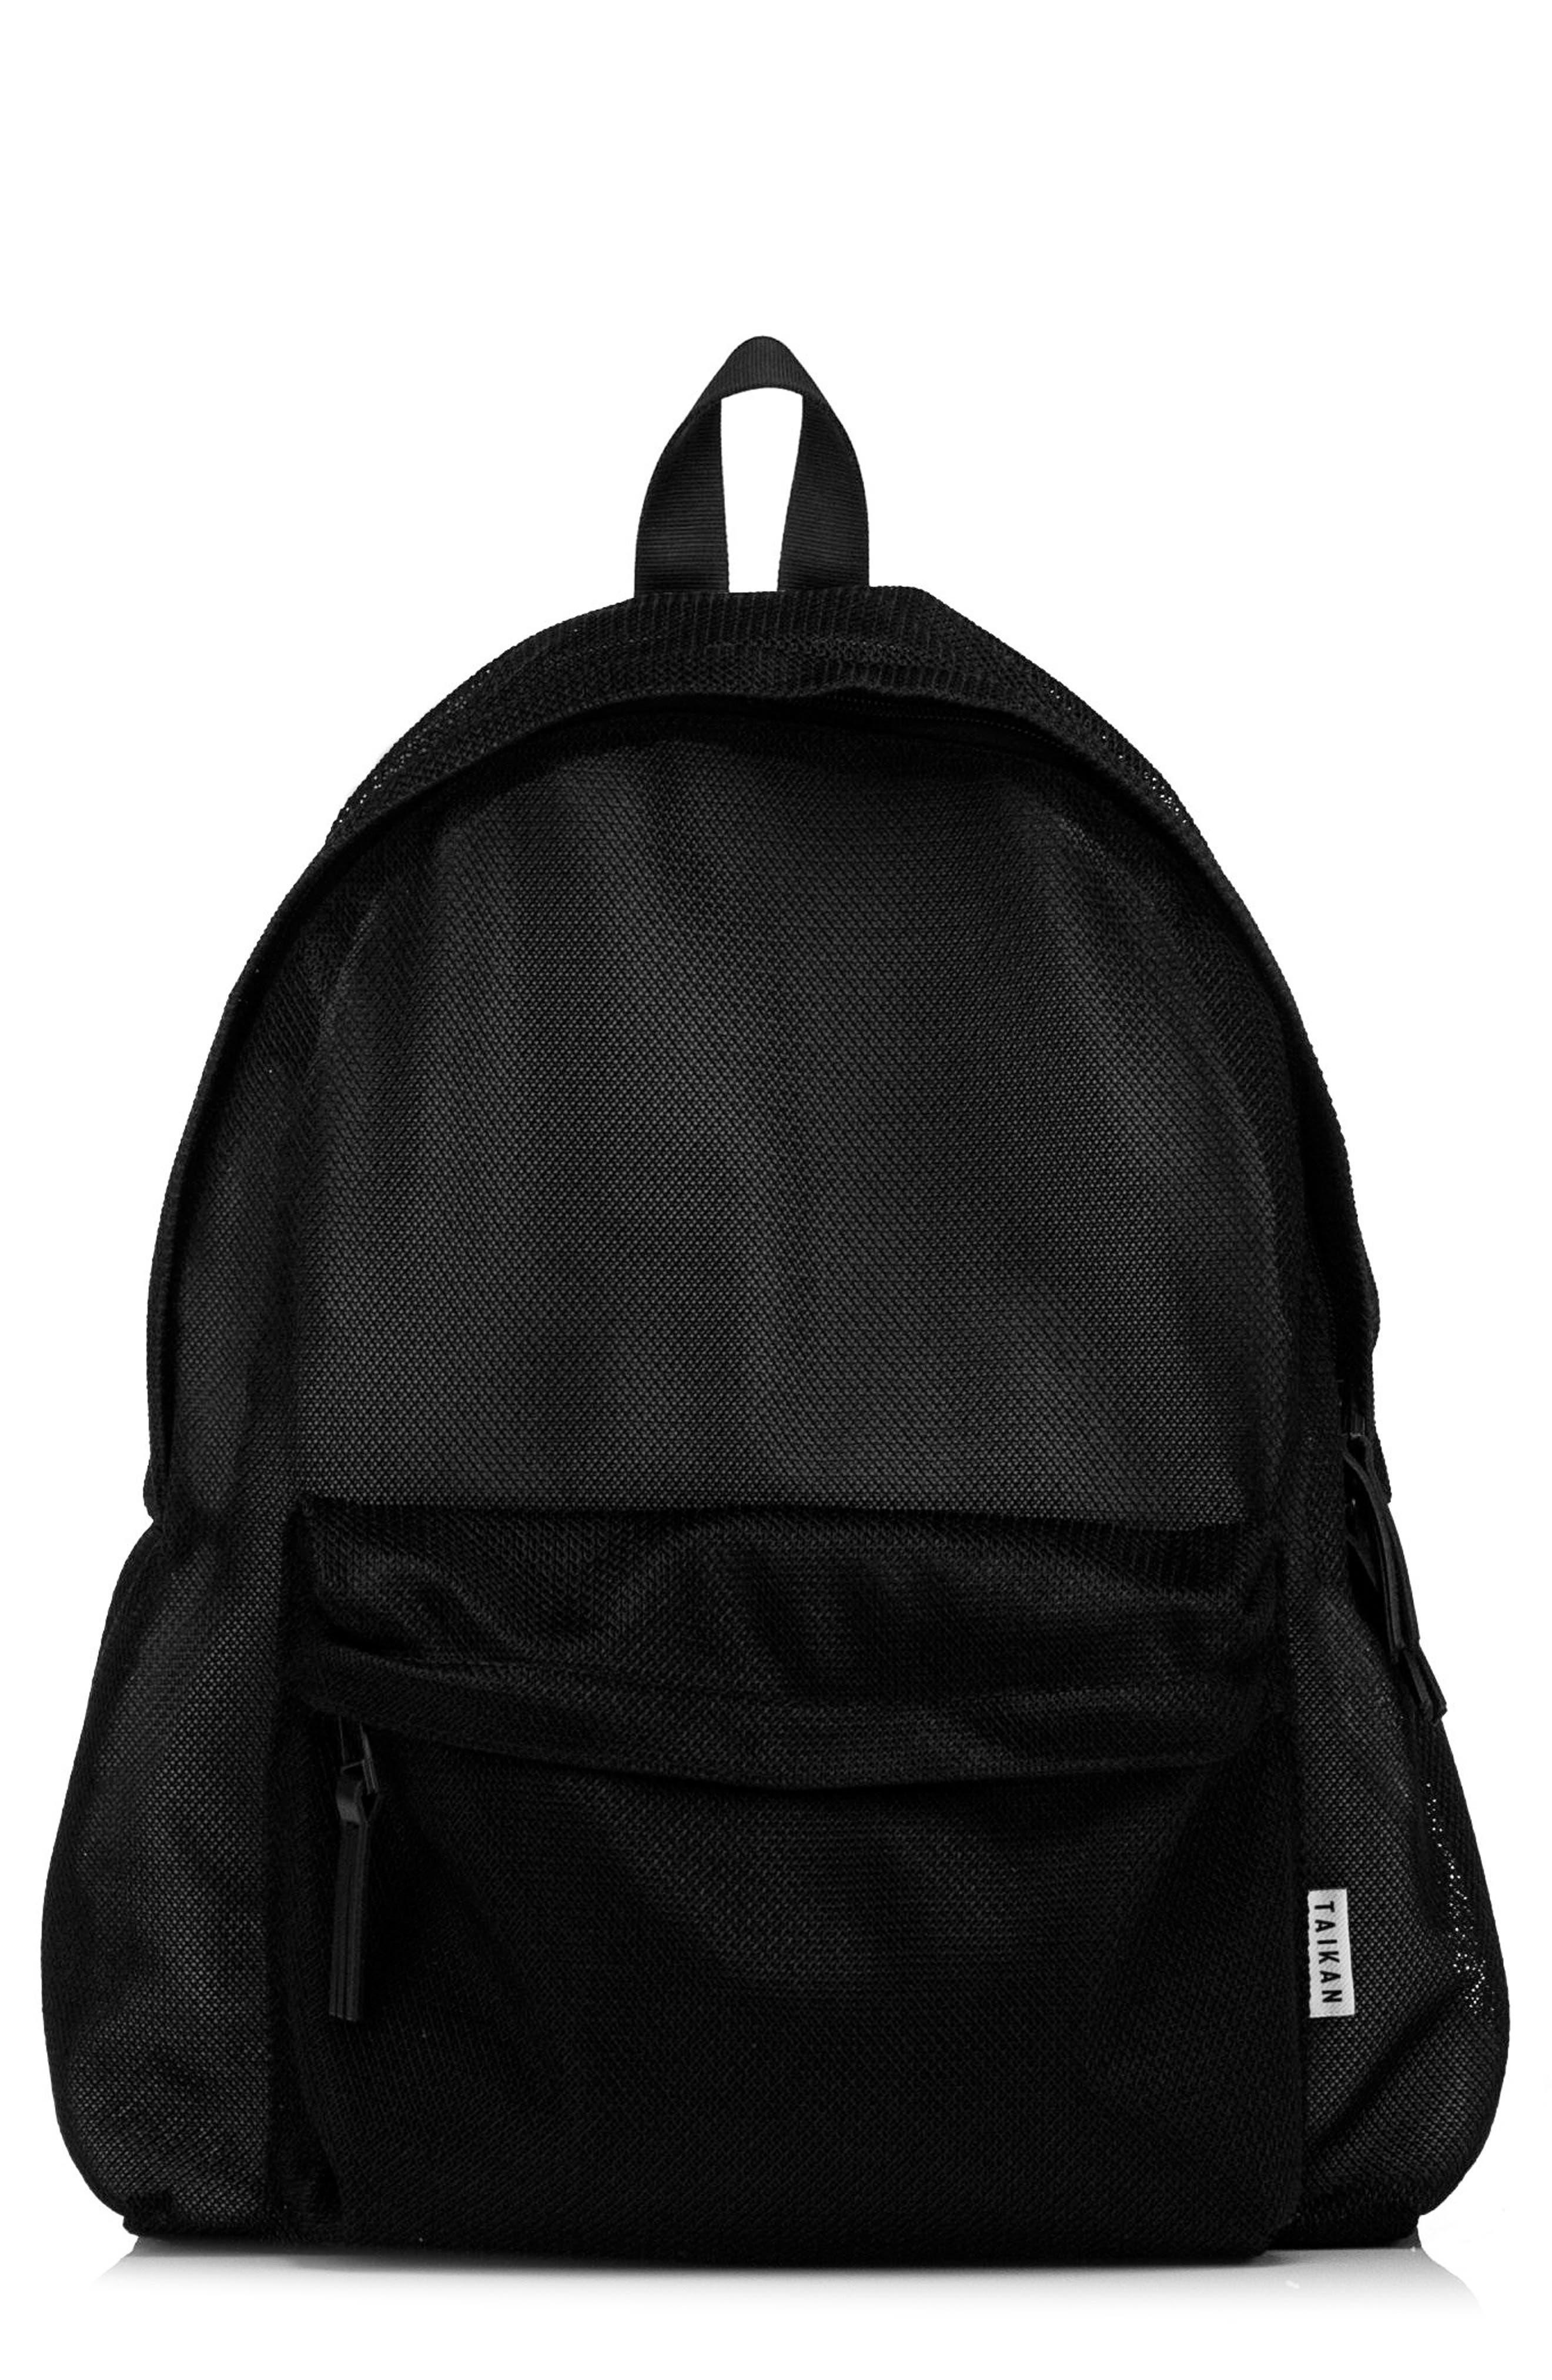 TAIKAN,                             Hornet Mesh Backpack,                             Main thumbnail 1, color,                             003